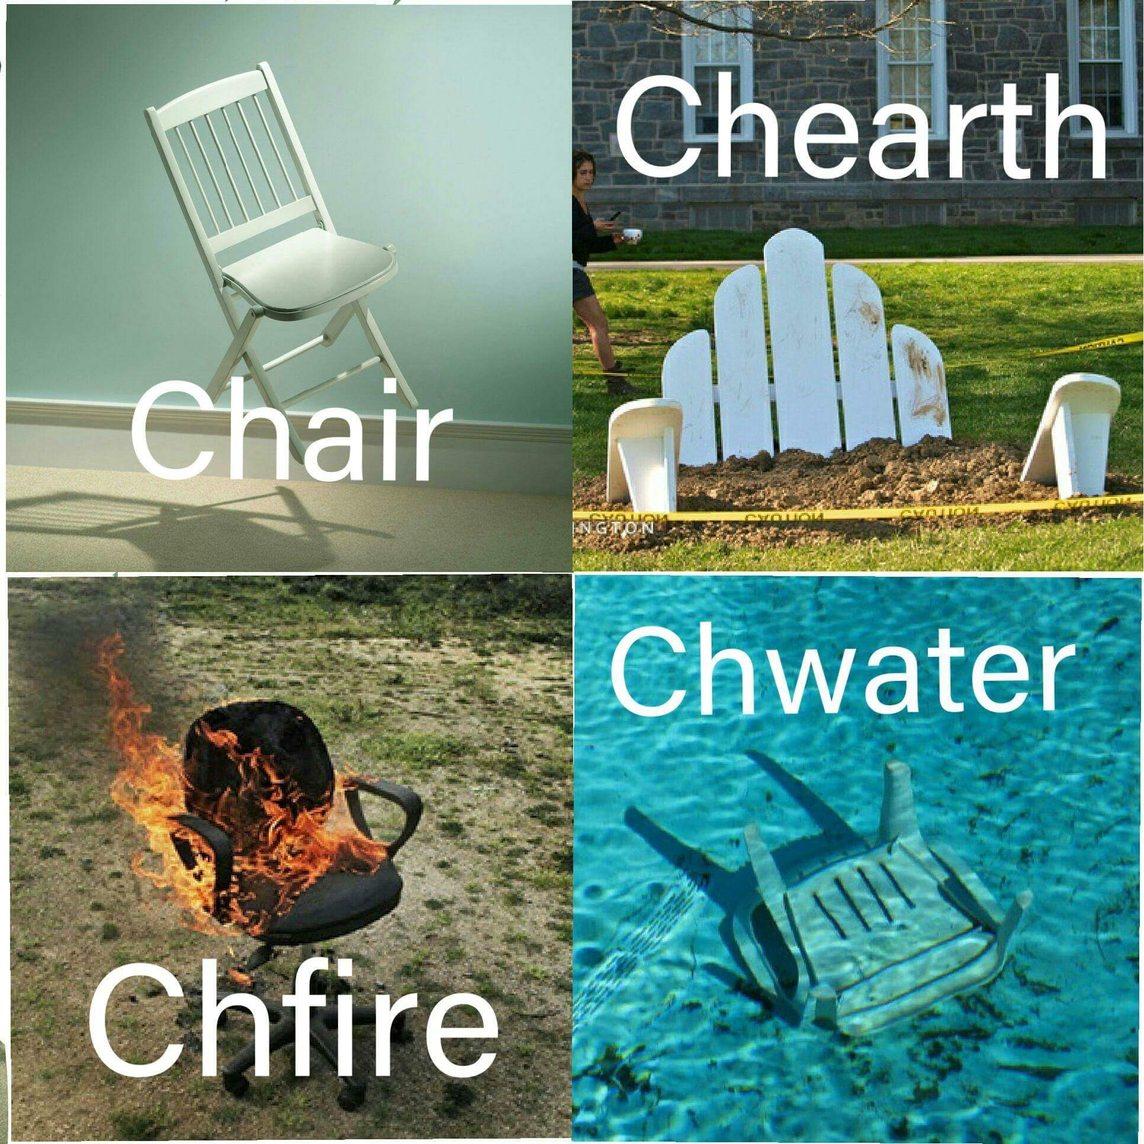 Elements - meme